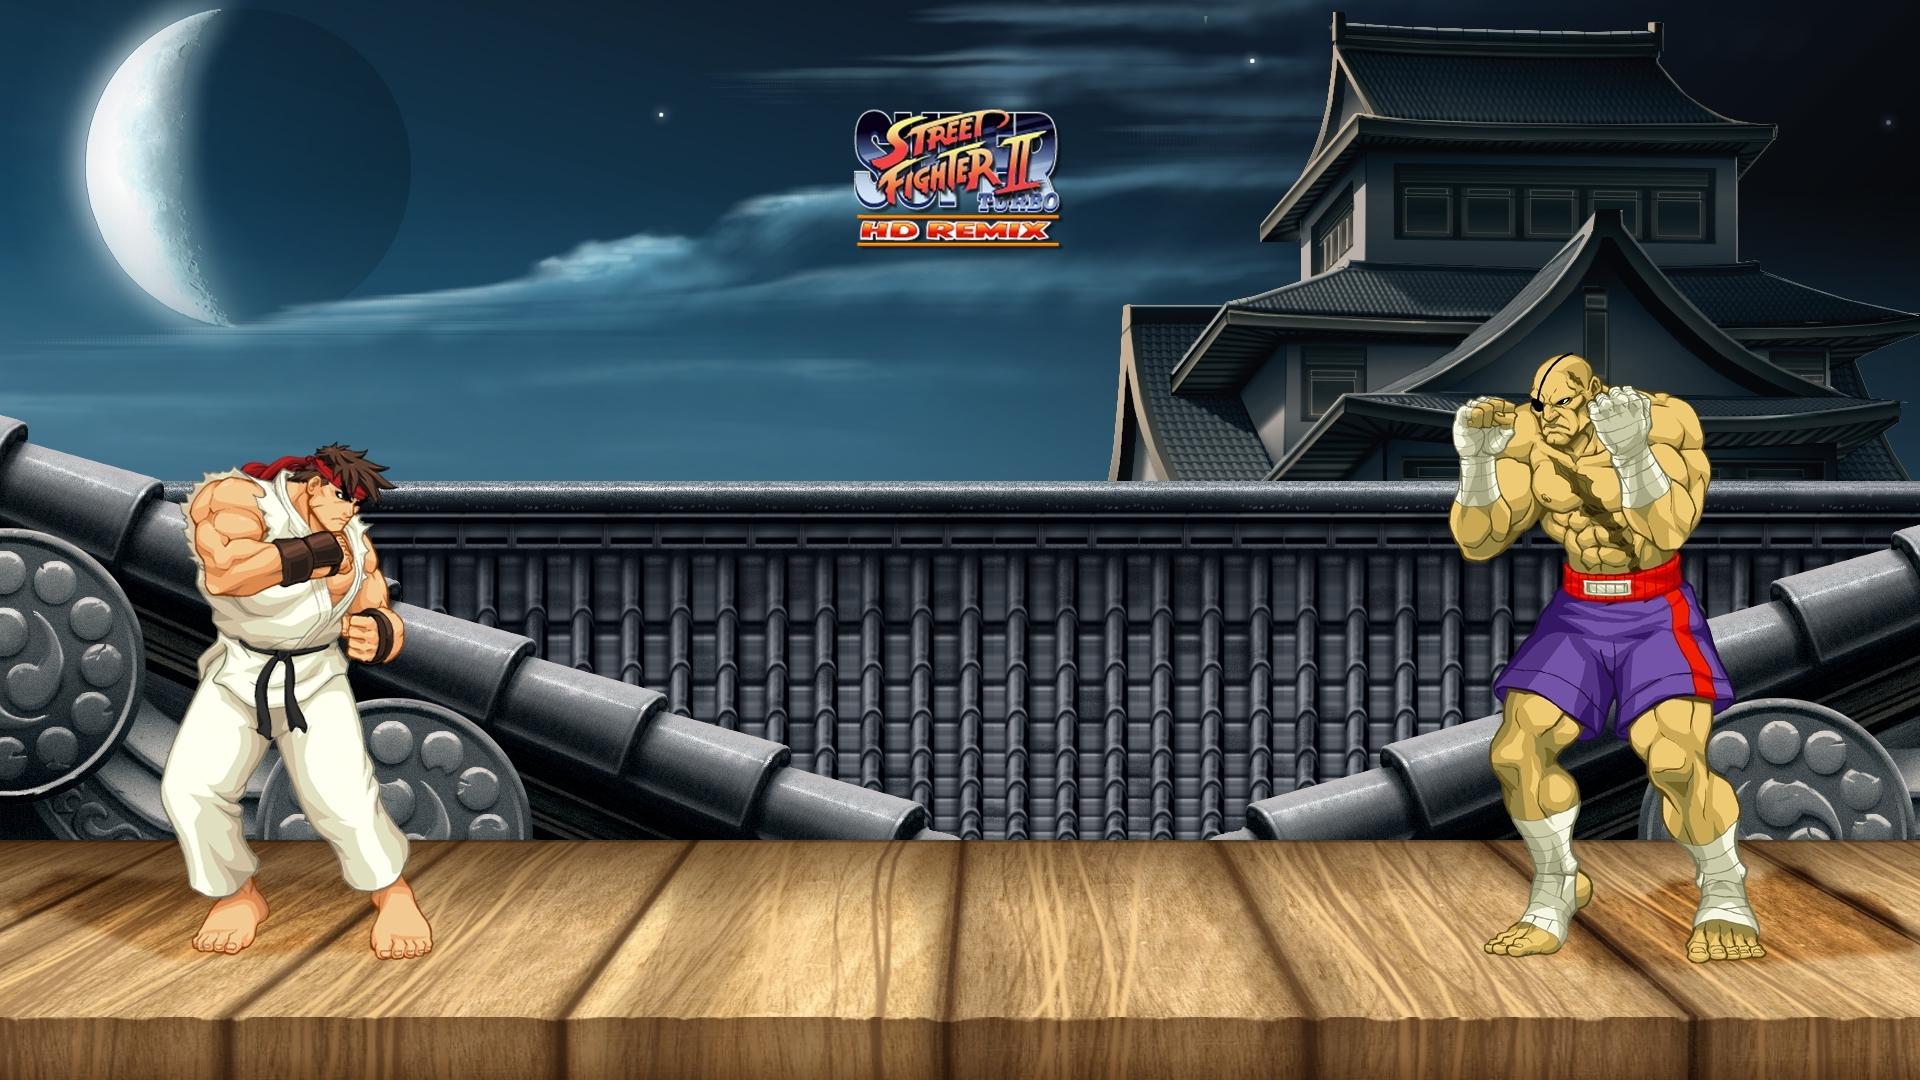 super street fighter 2 turbo wallpaper 44872 1920x1080 px